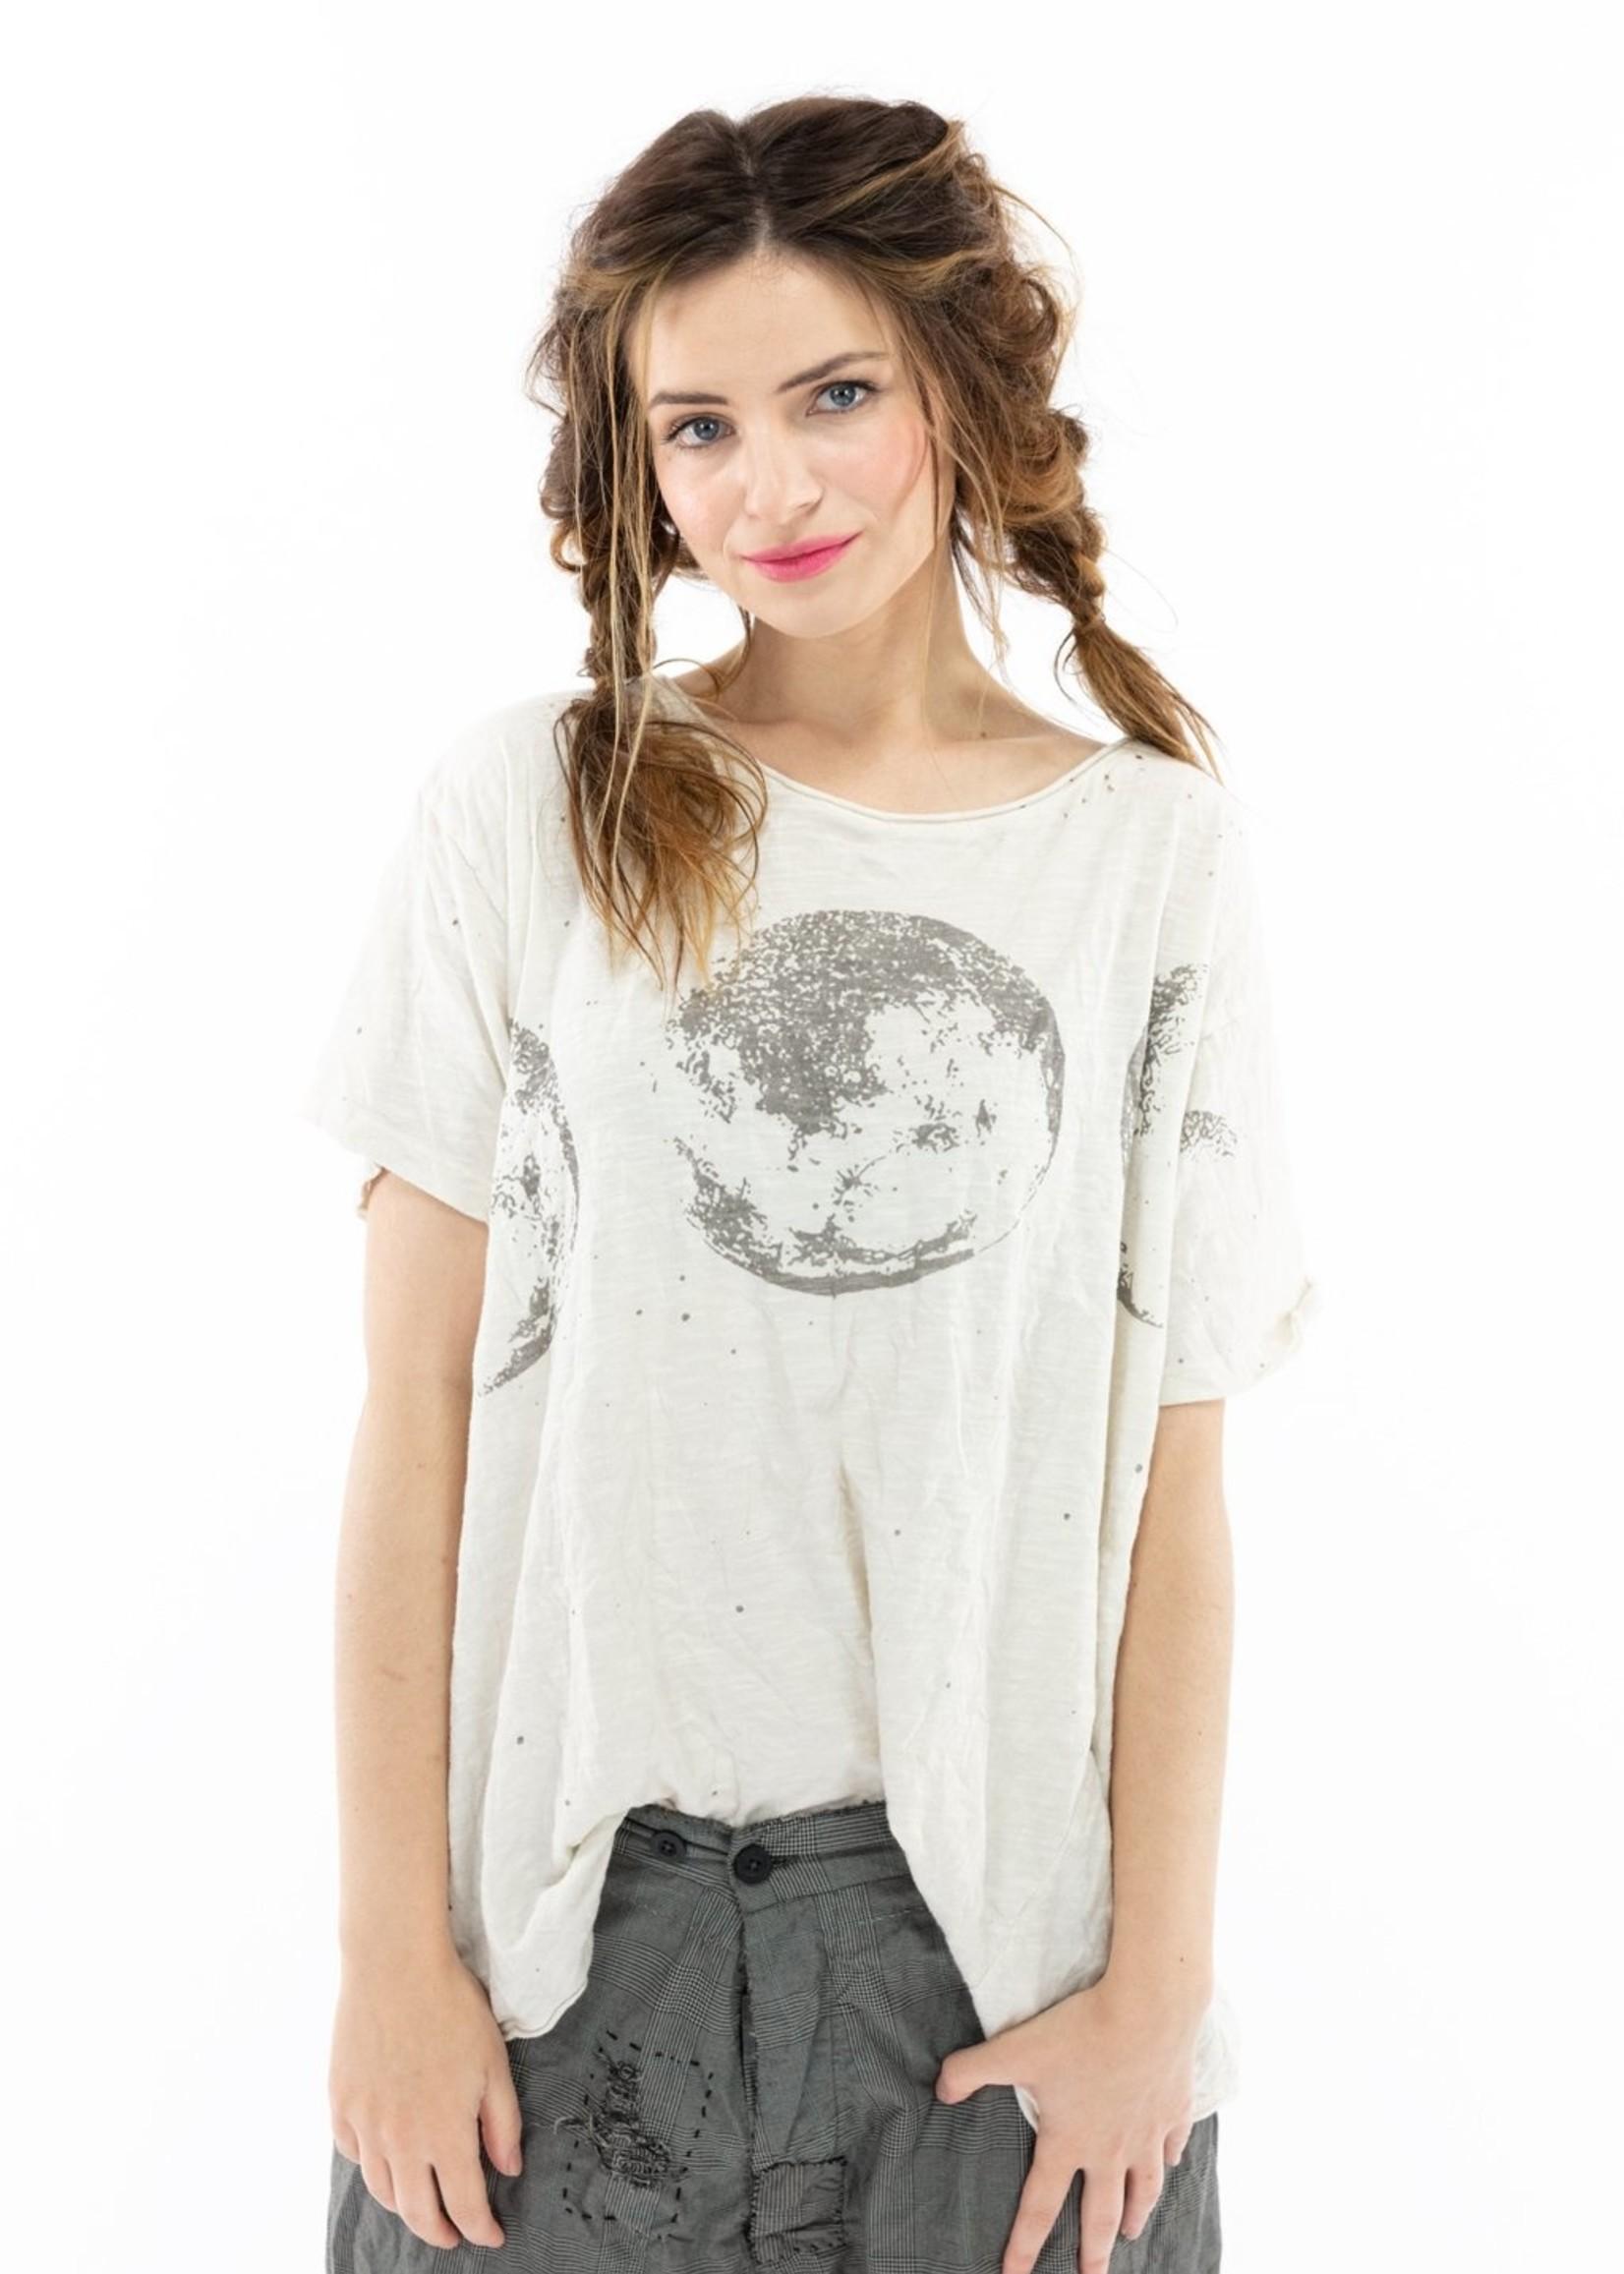 Magnolia Pearl Celestial Sphere T - Moonlight